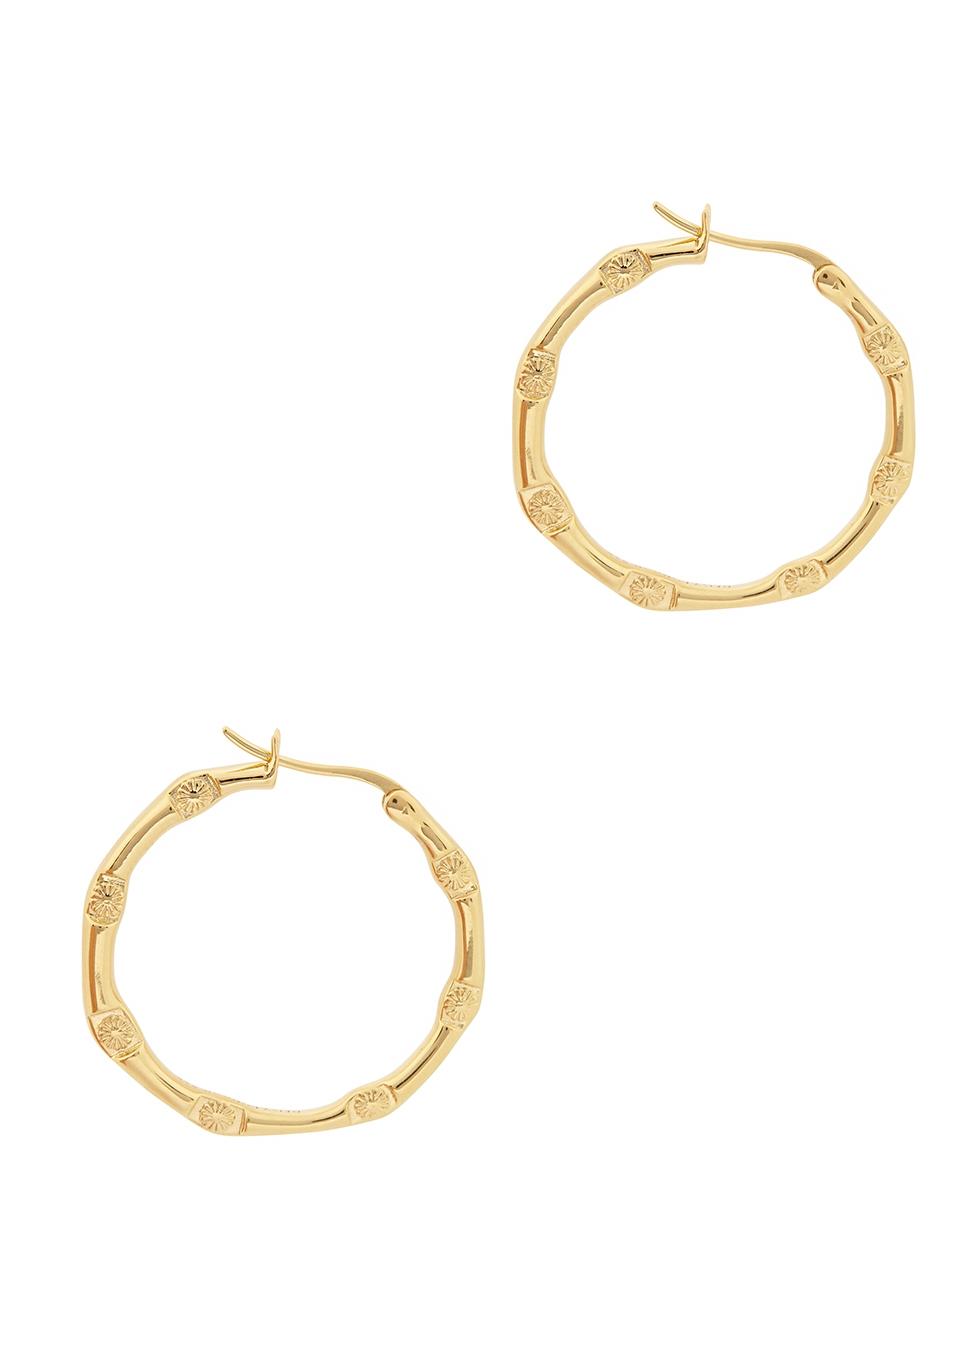 X Estée Lalonde Goddess Glow 18kt gold-plated hoop earrings